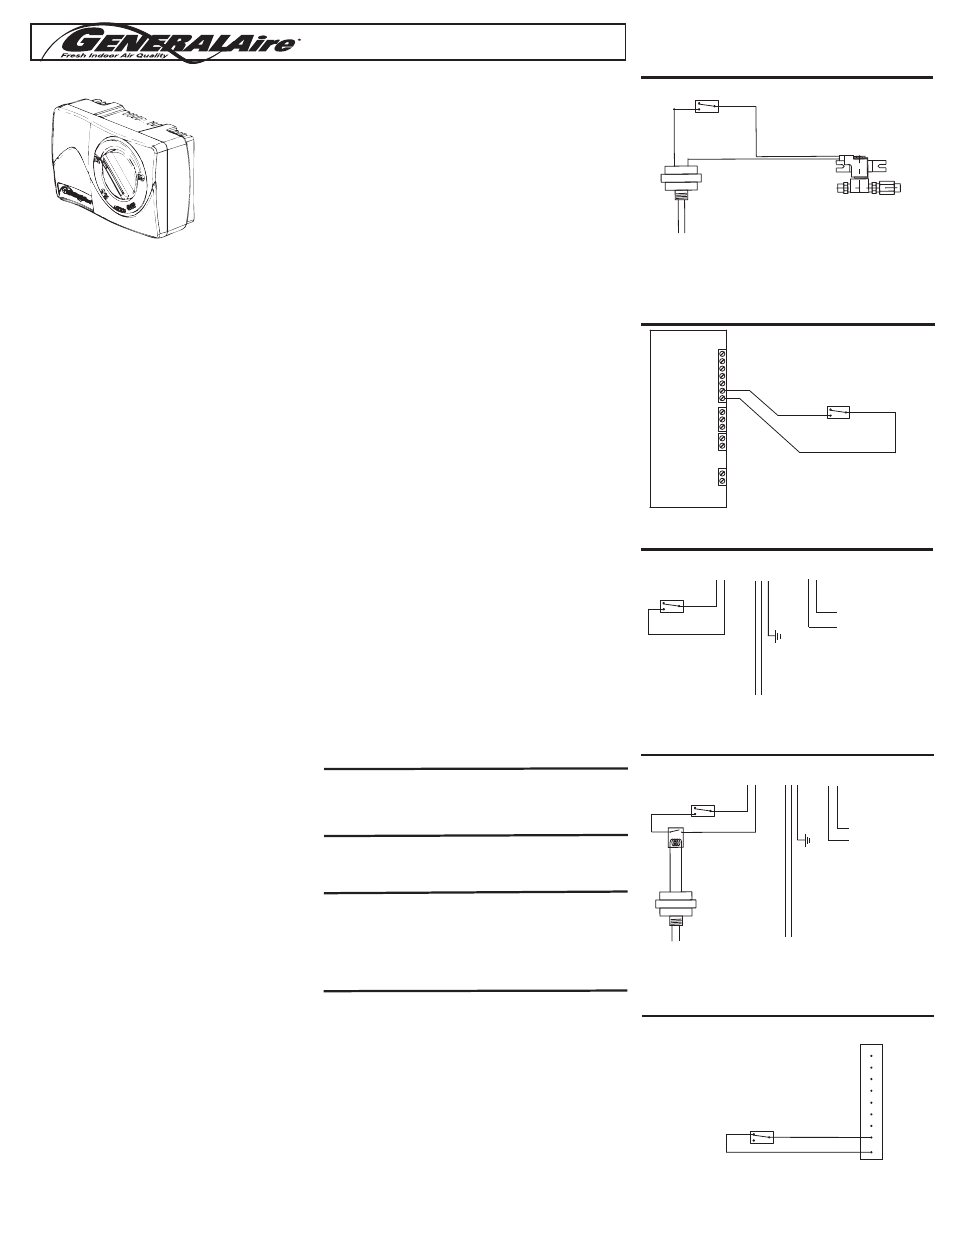 Generalaire Humidistat Wiring Diagram